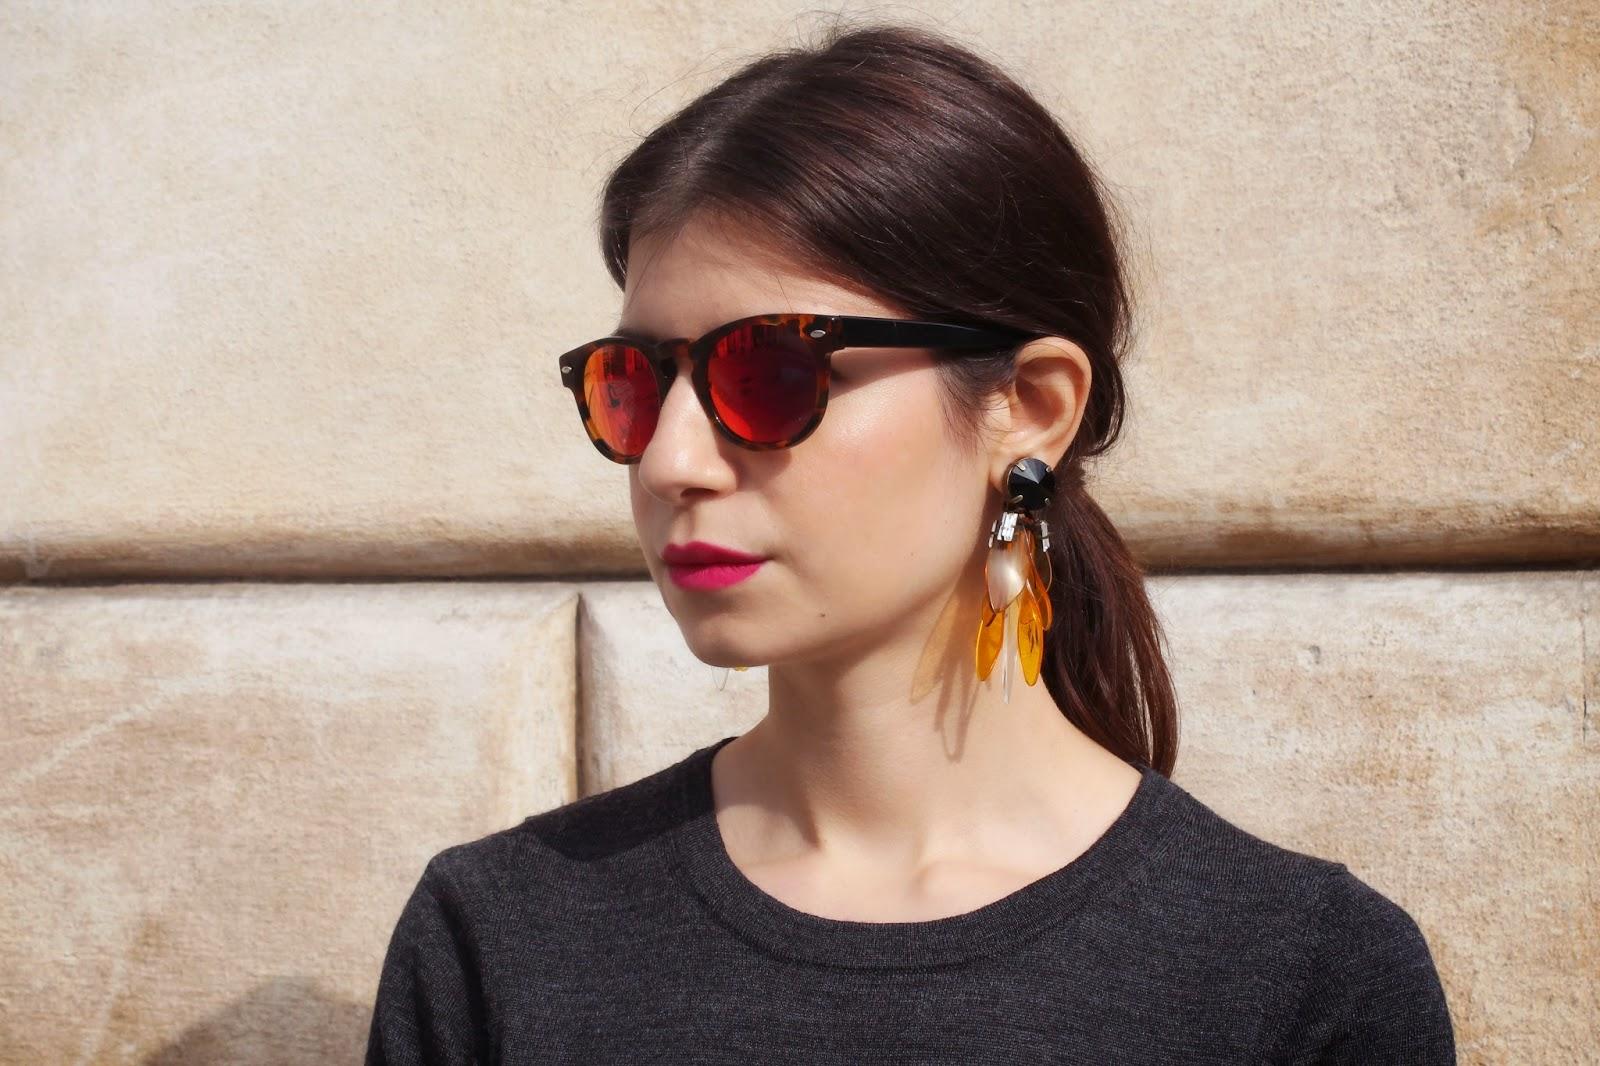 marni for H&M, revo, shades, mirror